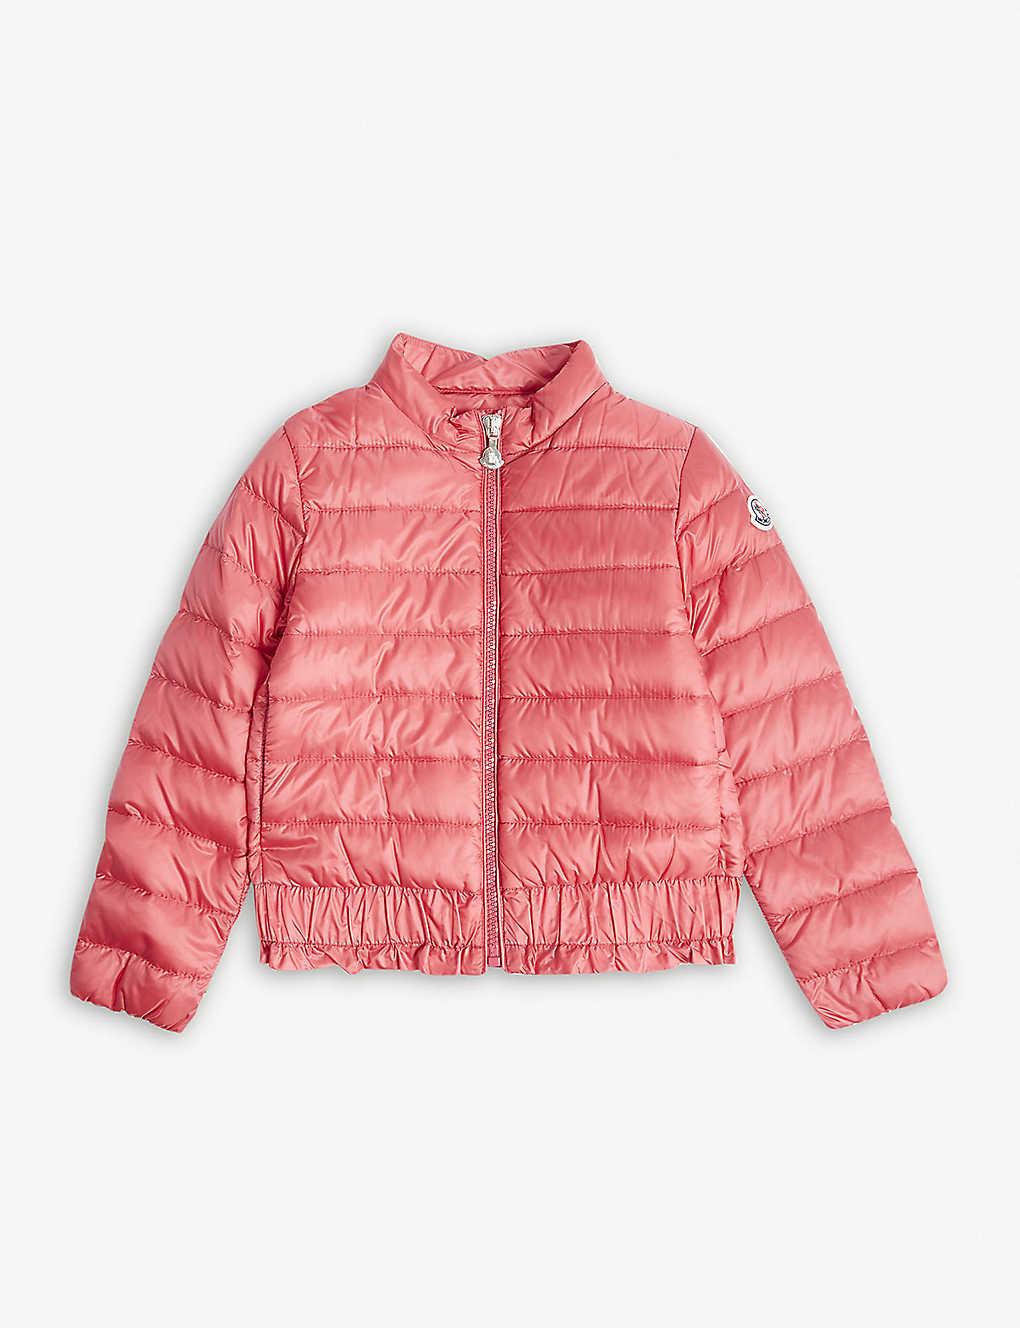 47812db4c MONCLER - Abricot ruffled hem padded coat 4-14 years | Selfridges.com